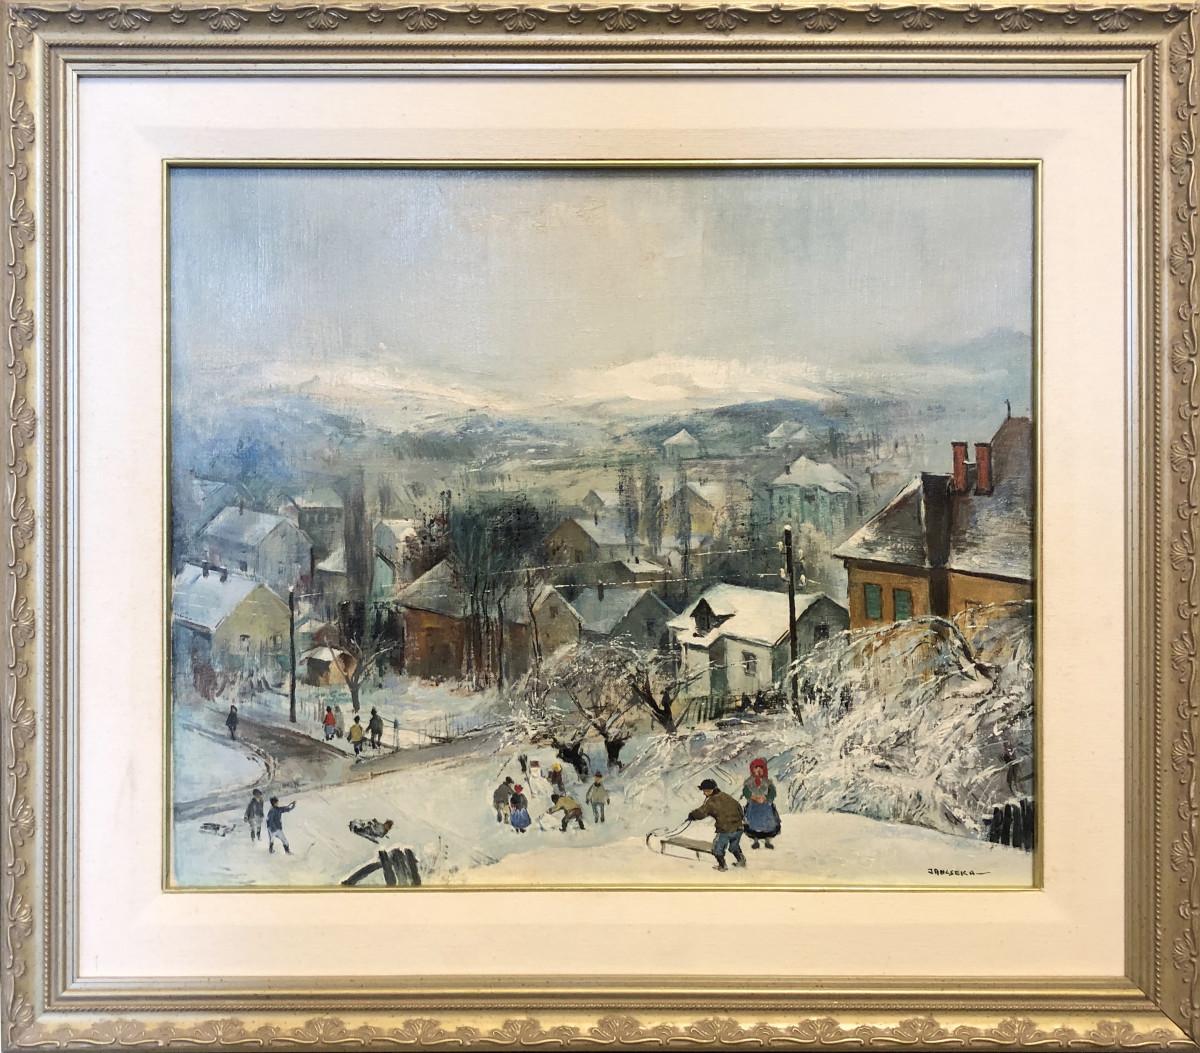 0663 - Winter Village by Antal Jancsek (1907-1985)